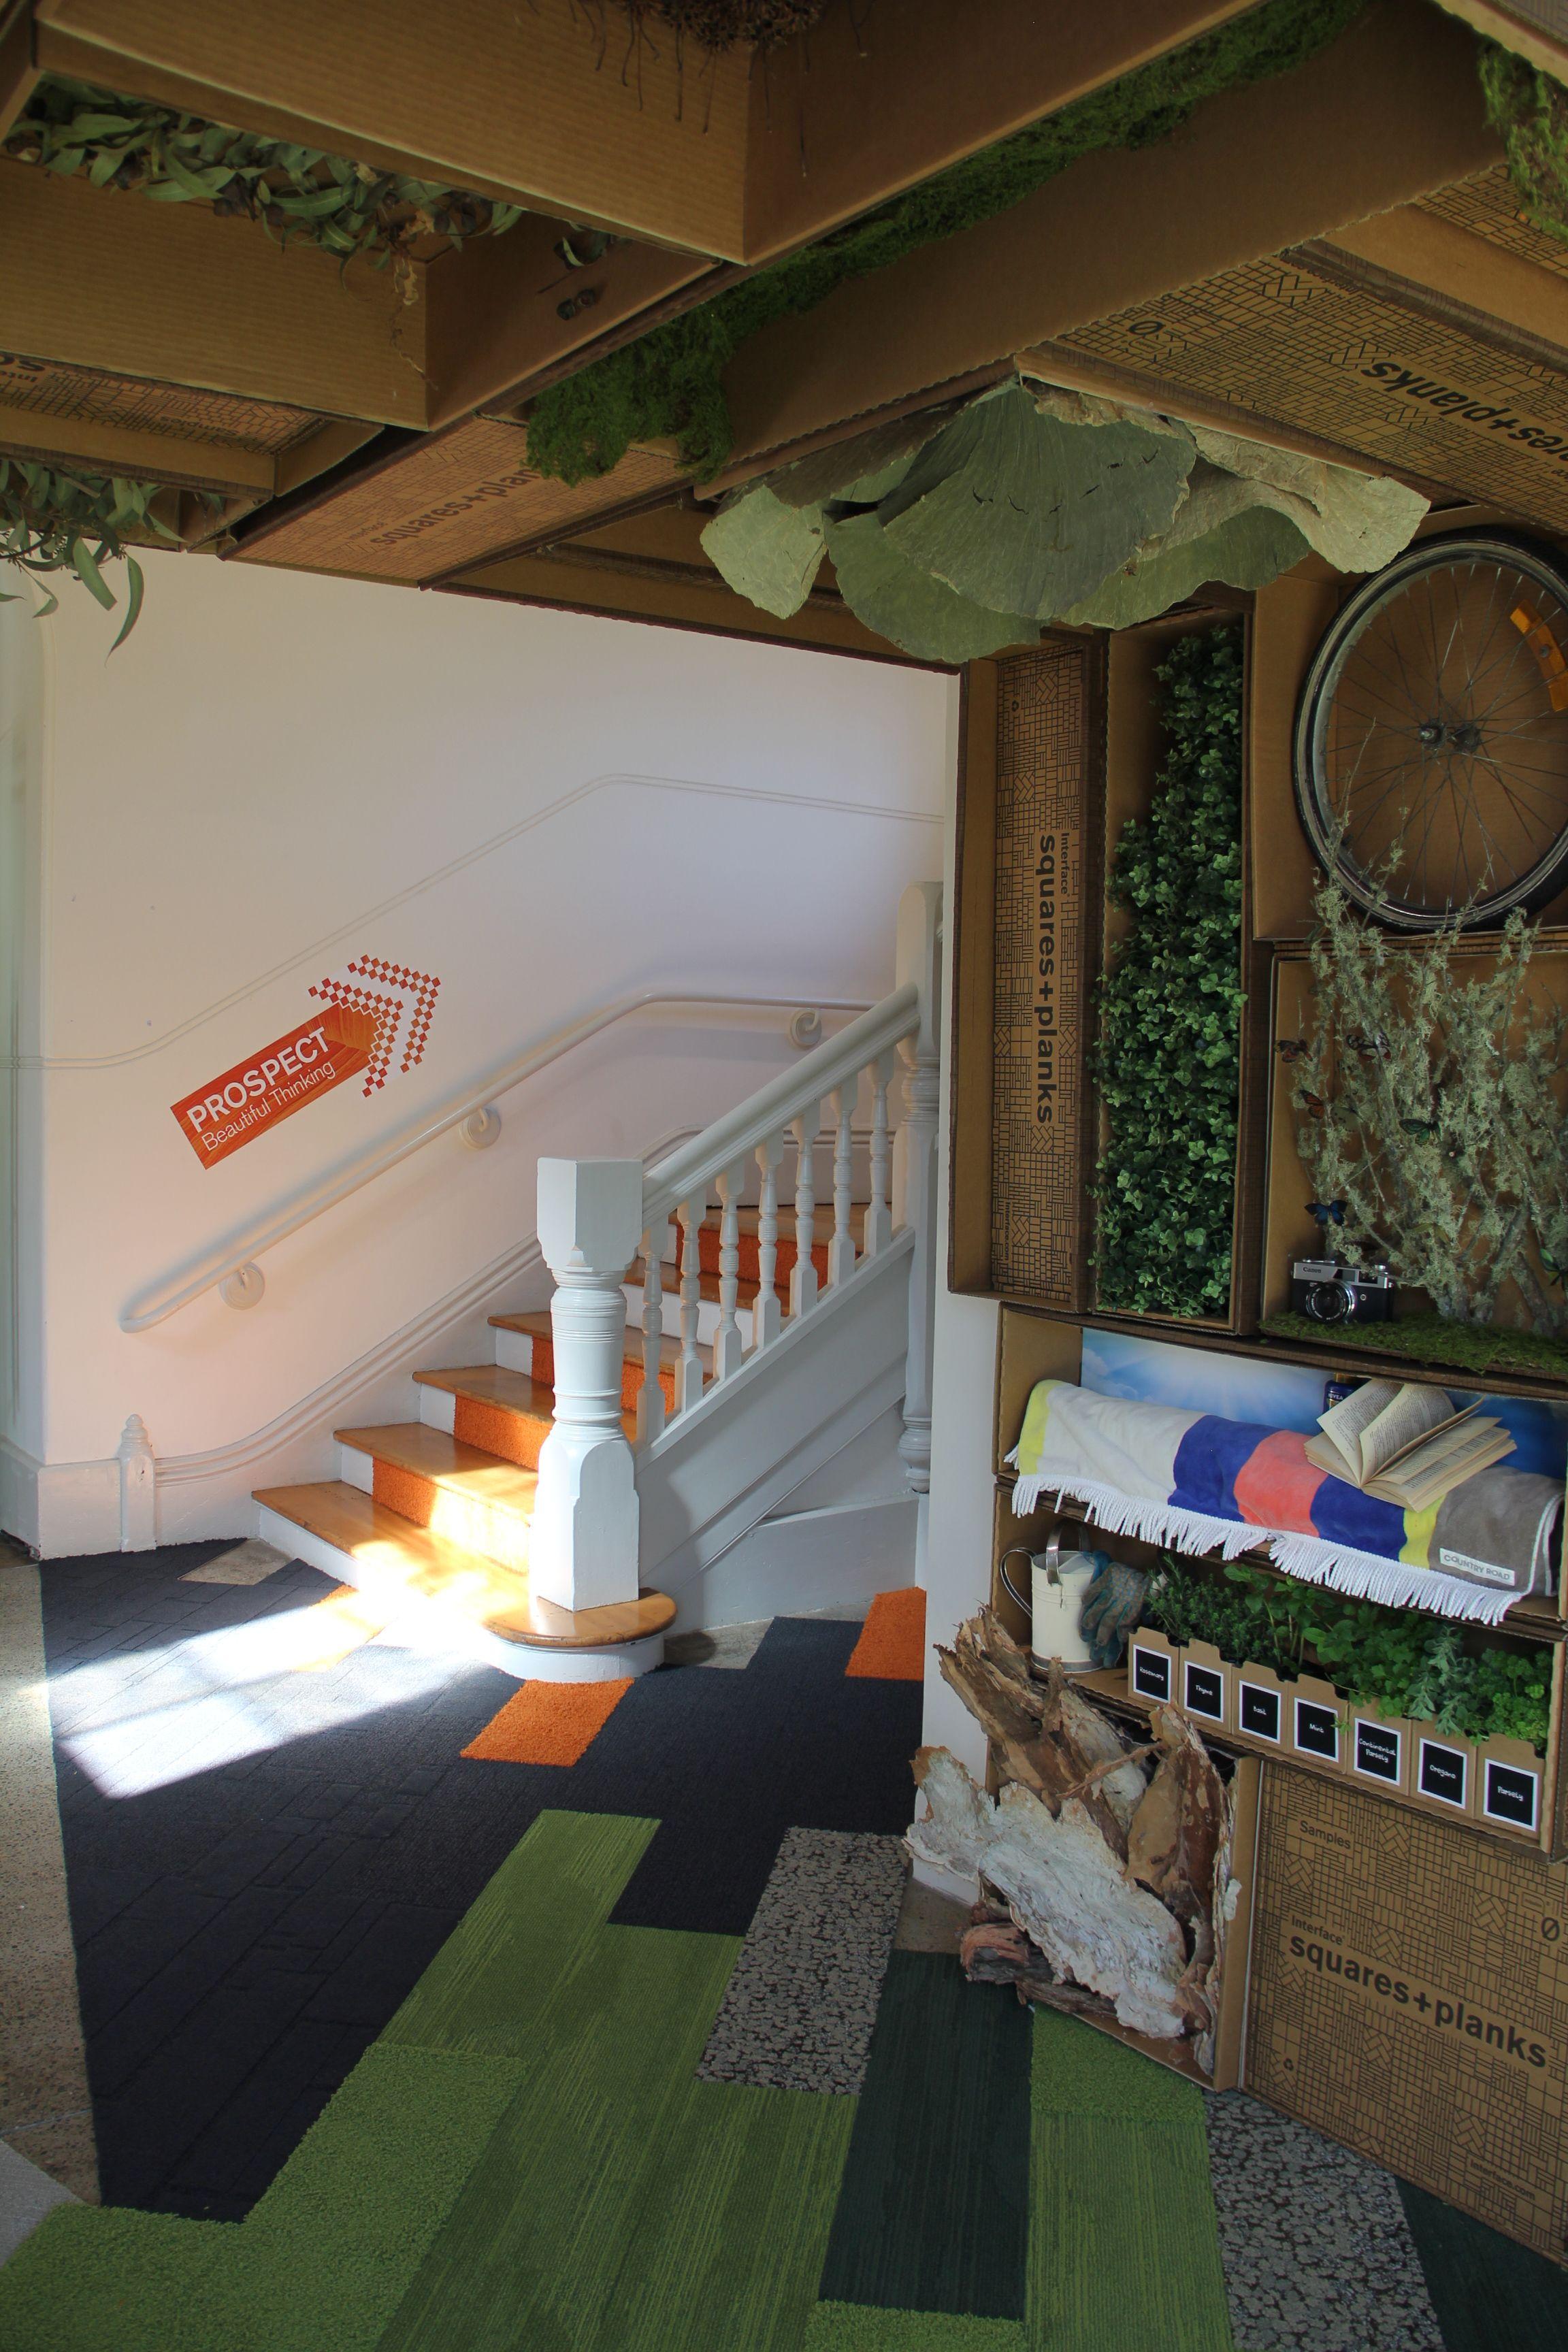 Buy Carpet Tiles Sydney